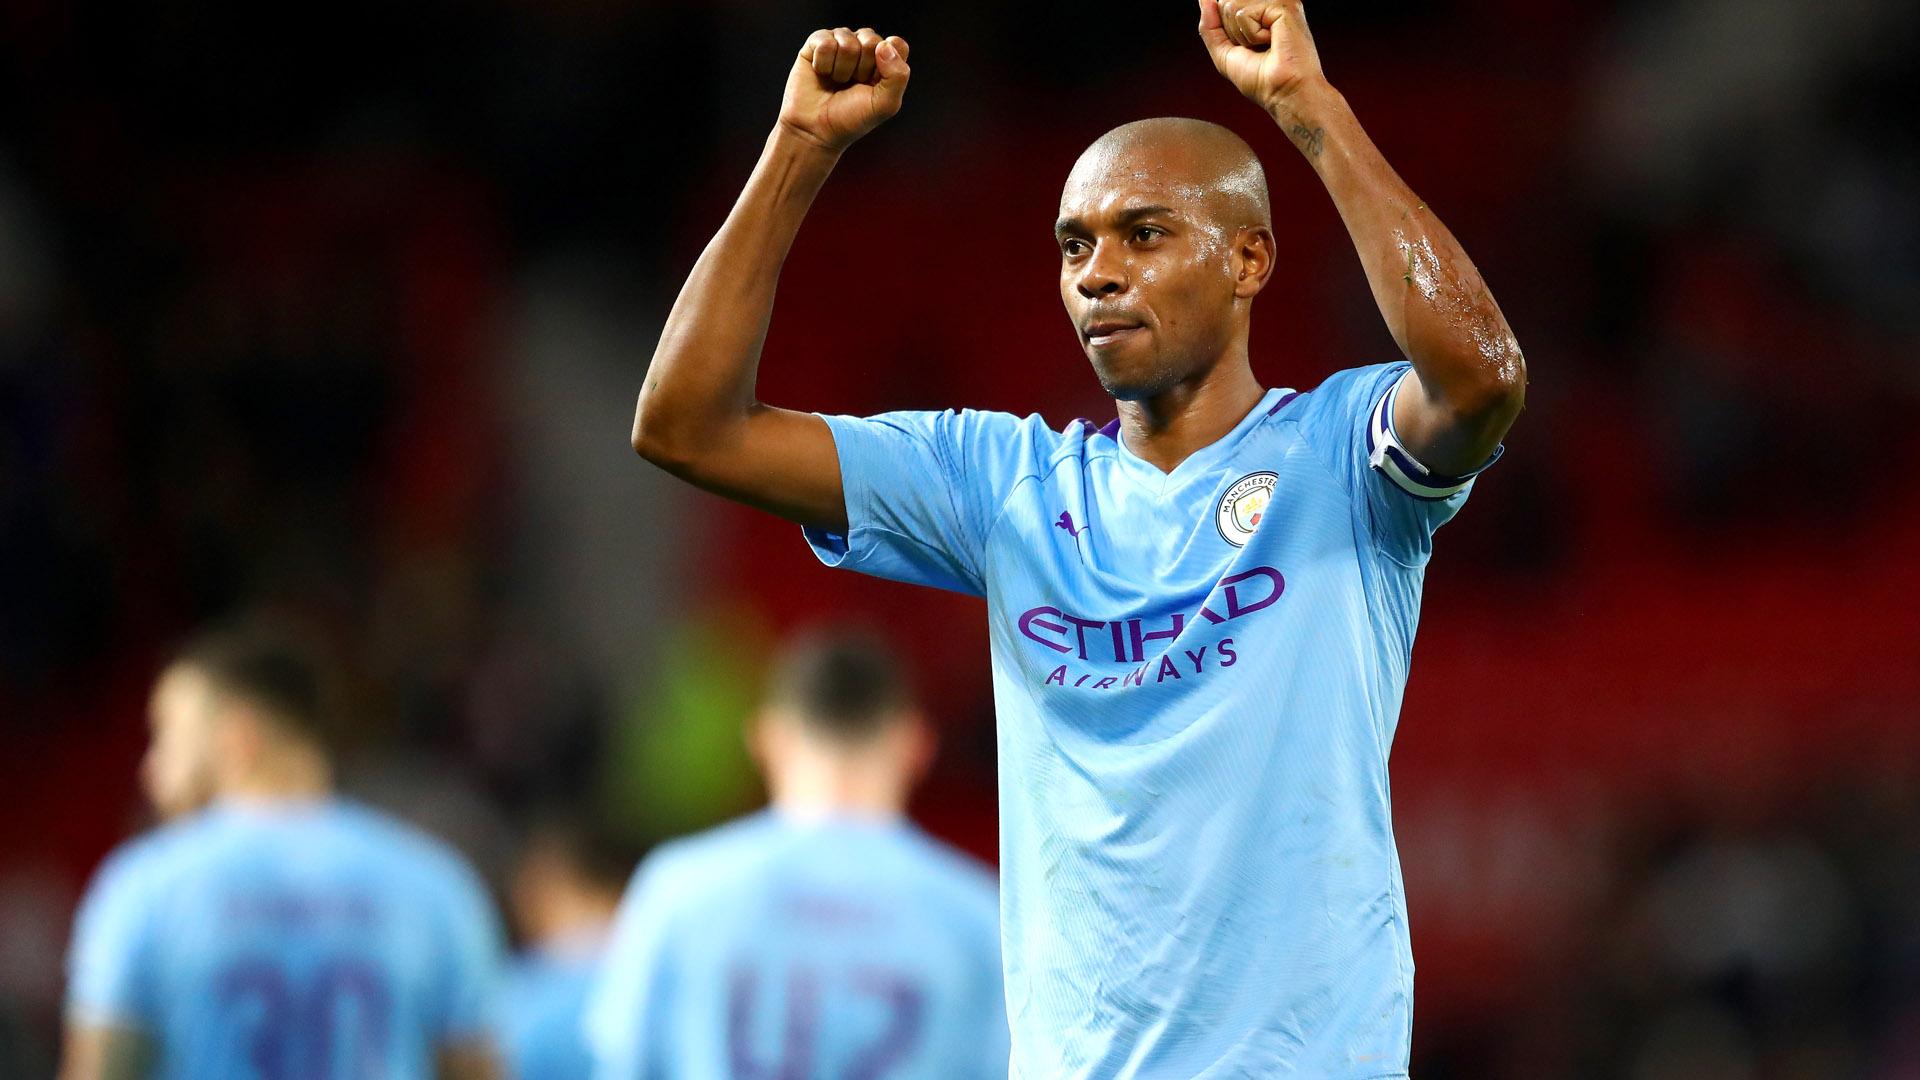 OFFICIEL - Fernandinho prolonge à Manchester City (2021)